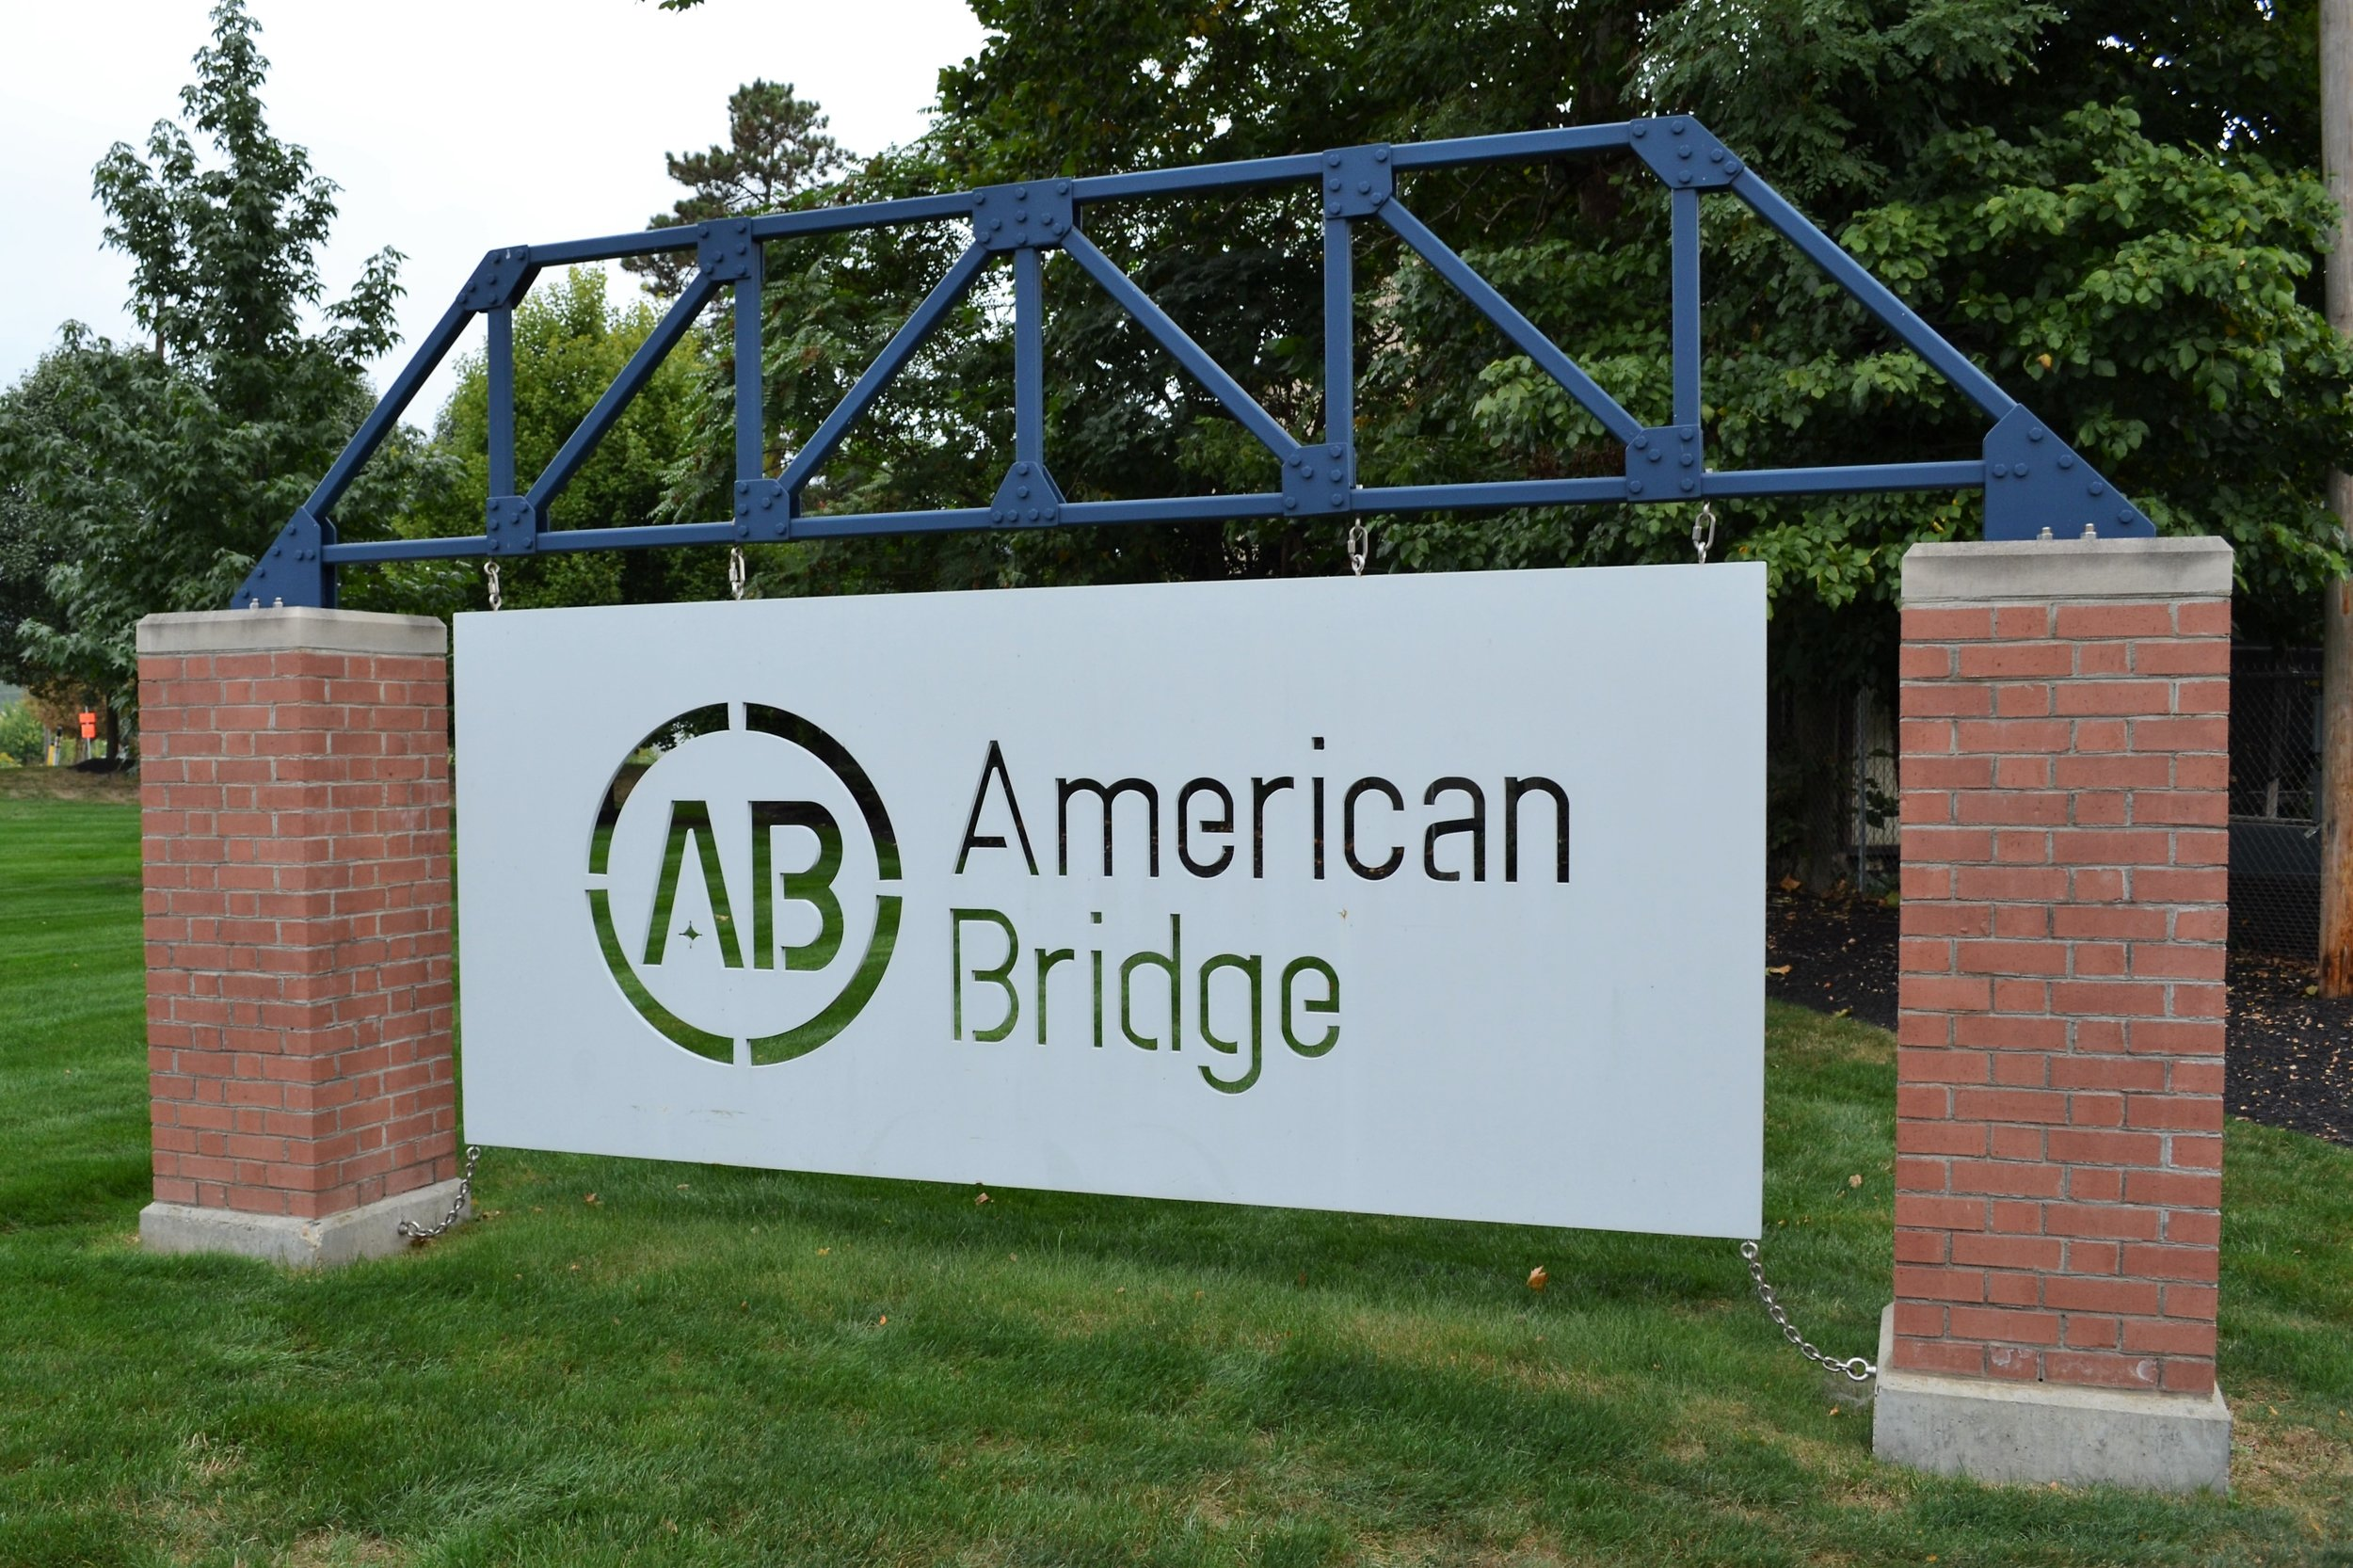 American Bridge Company - 1000 American Bridge Way, (412) 631-1000